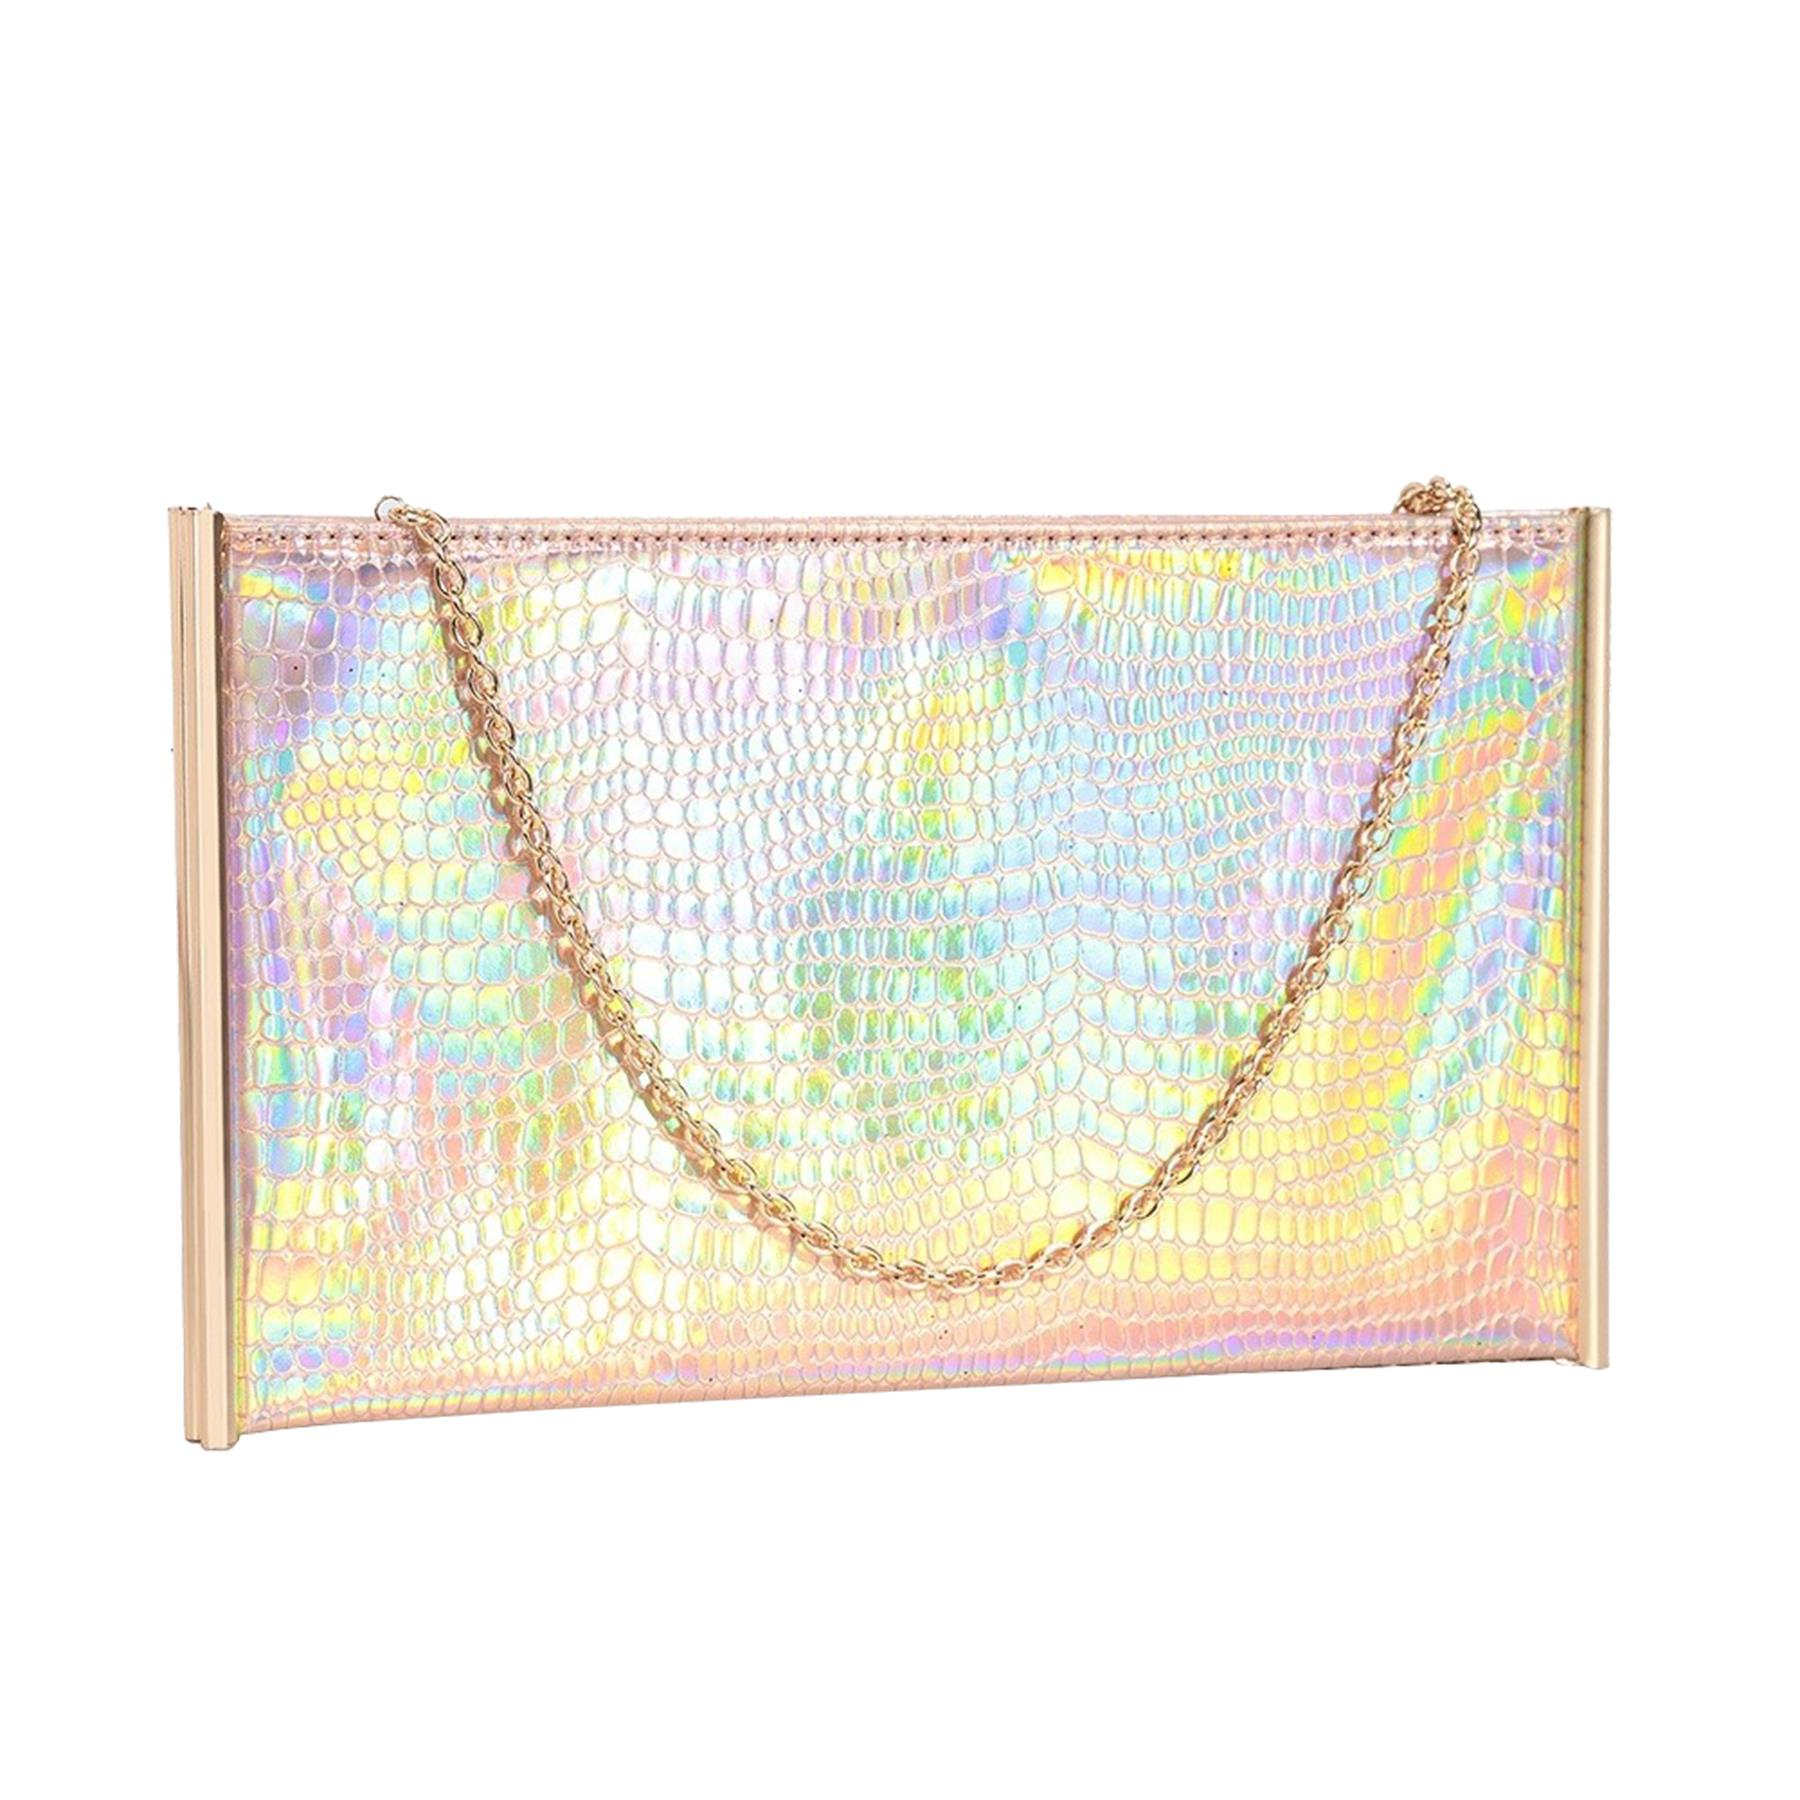 New-Ladies-Metallic-Trim-Velvet-Shimmer-Hologram-Croc-Evening-Clutch-Bag thumbnail 15